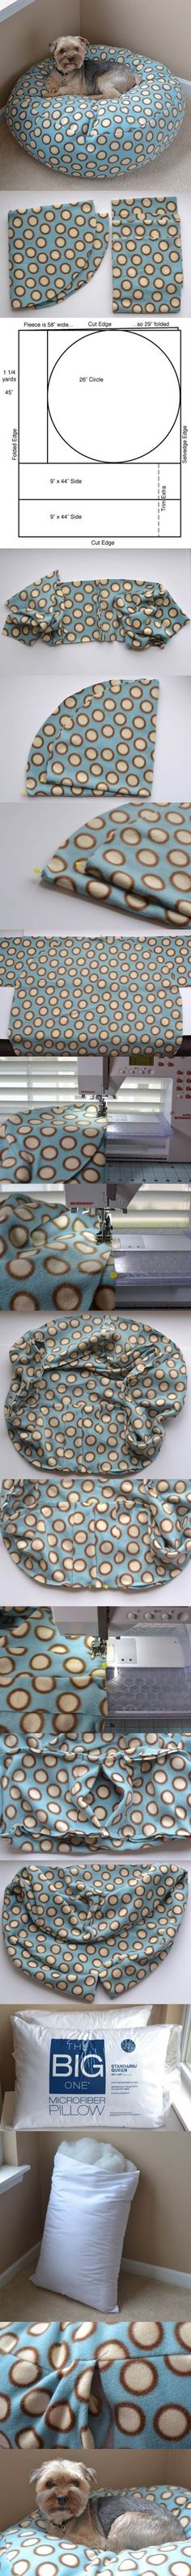 DIY Fleece Dog Bed 2